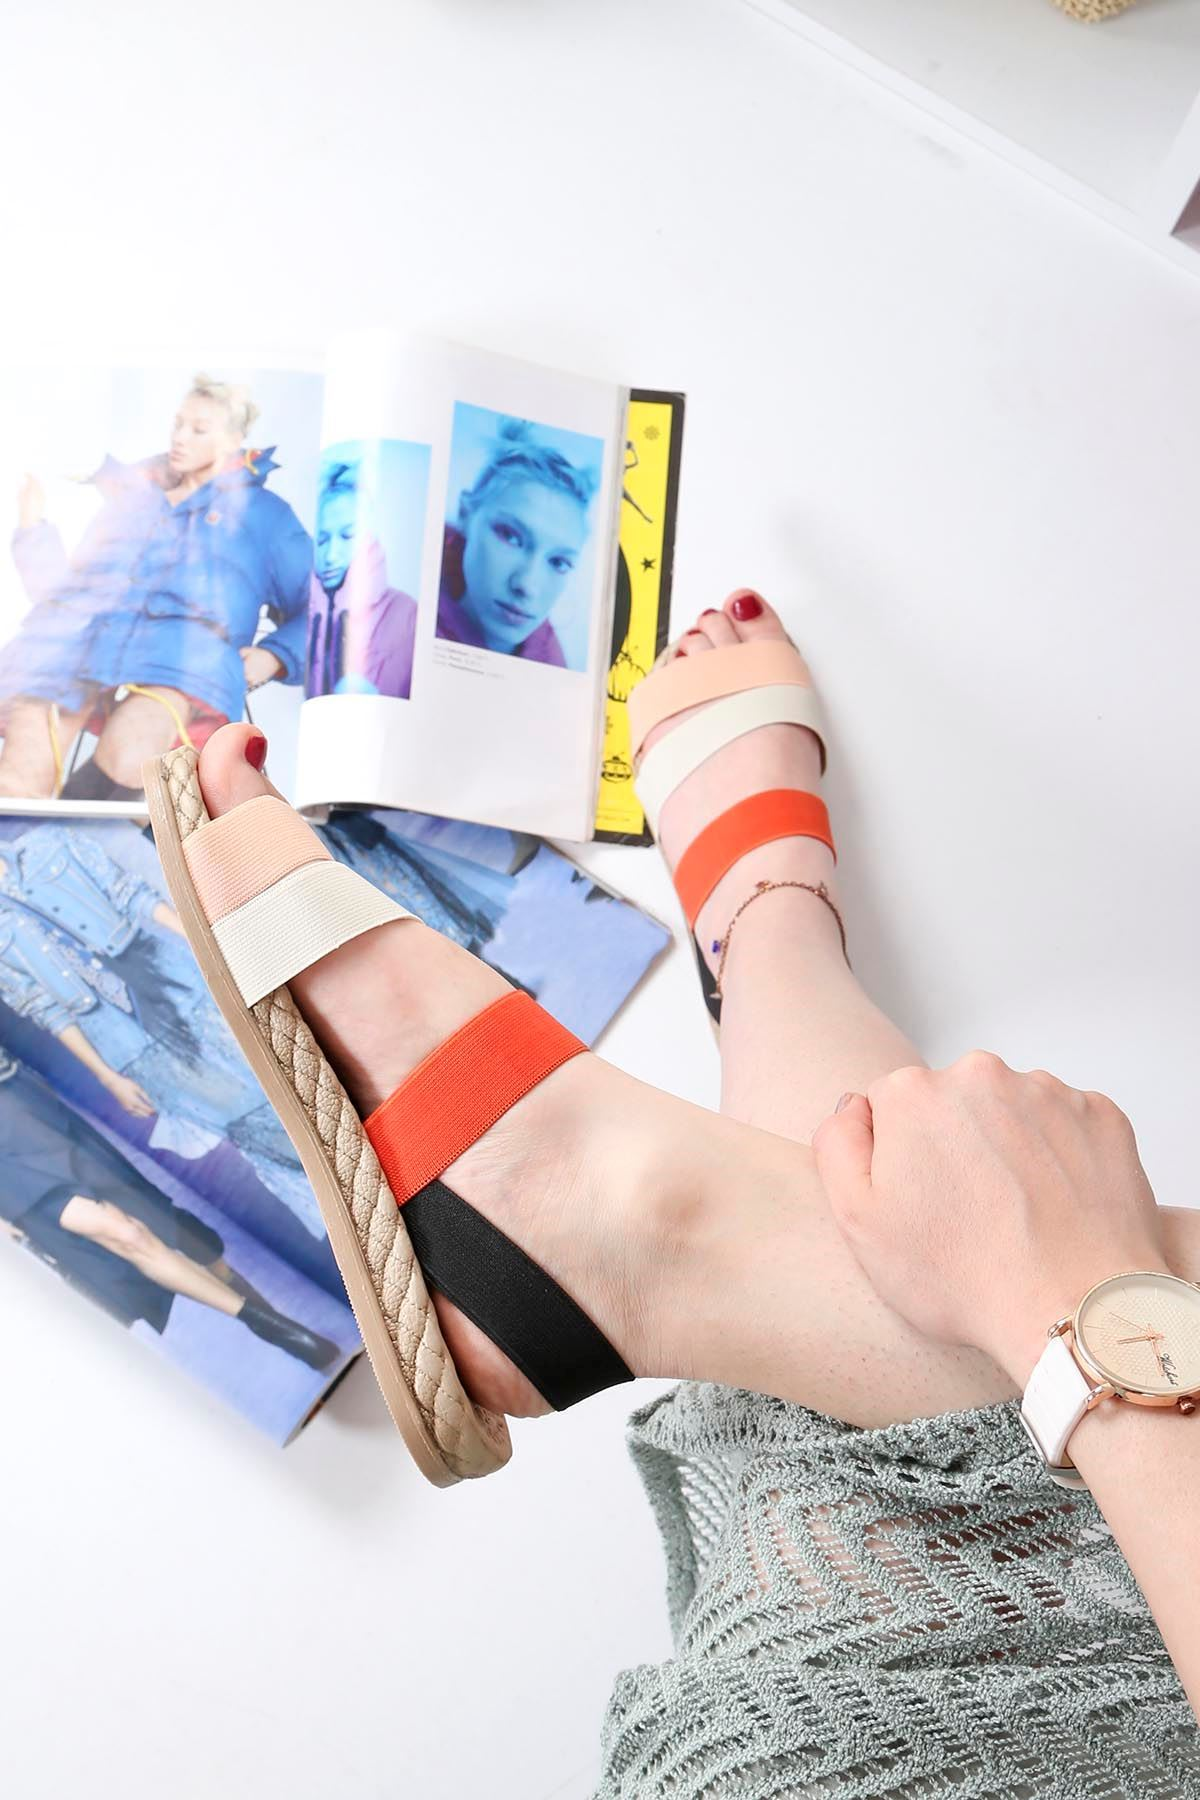 Brk-2020 Lastikli Sandalet pudra Beyaz Turuncu